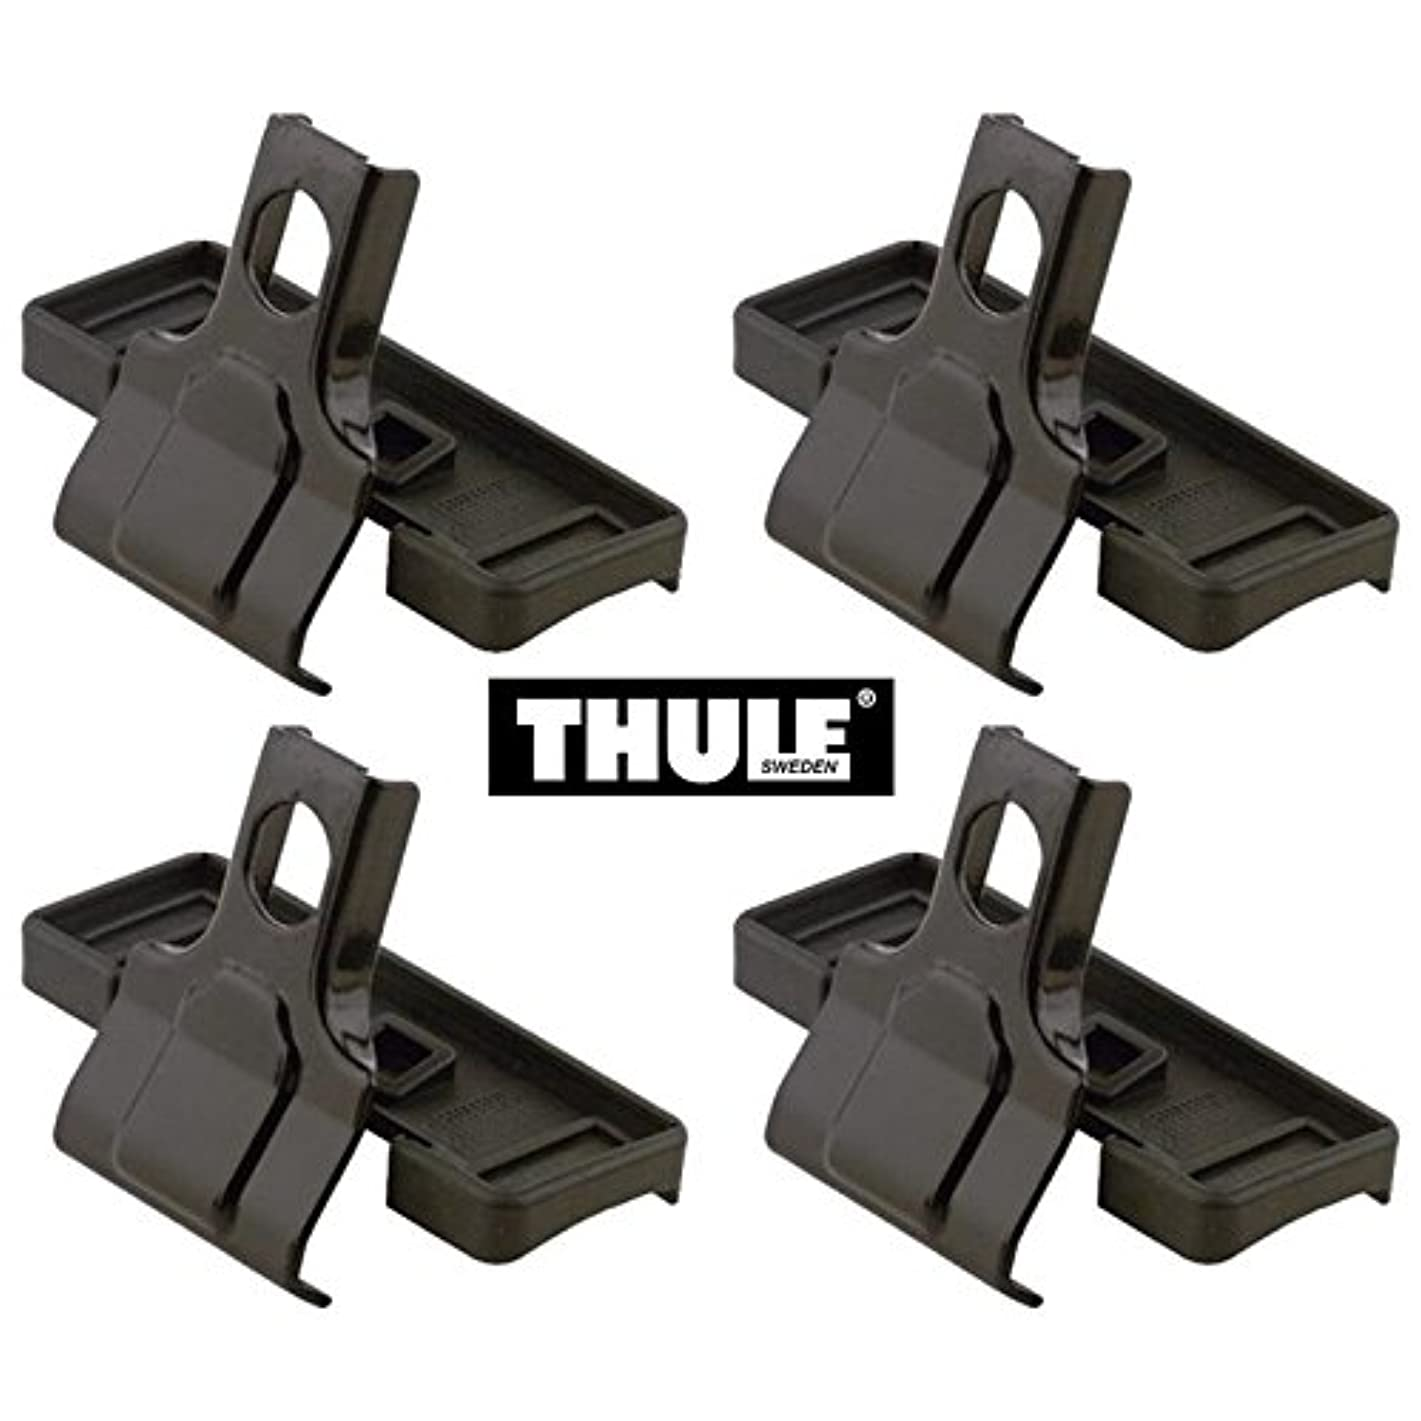 Thule 1077 Rapid Fitting Kit